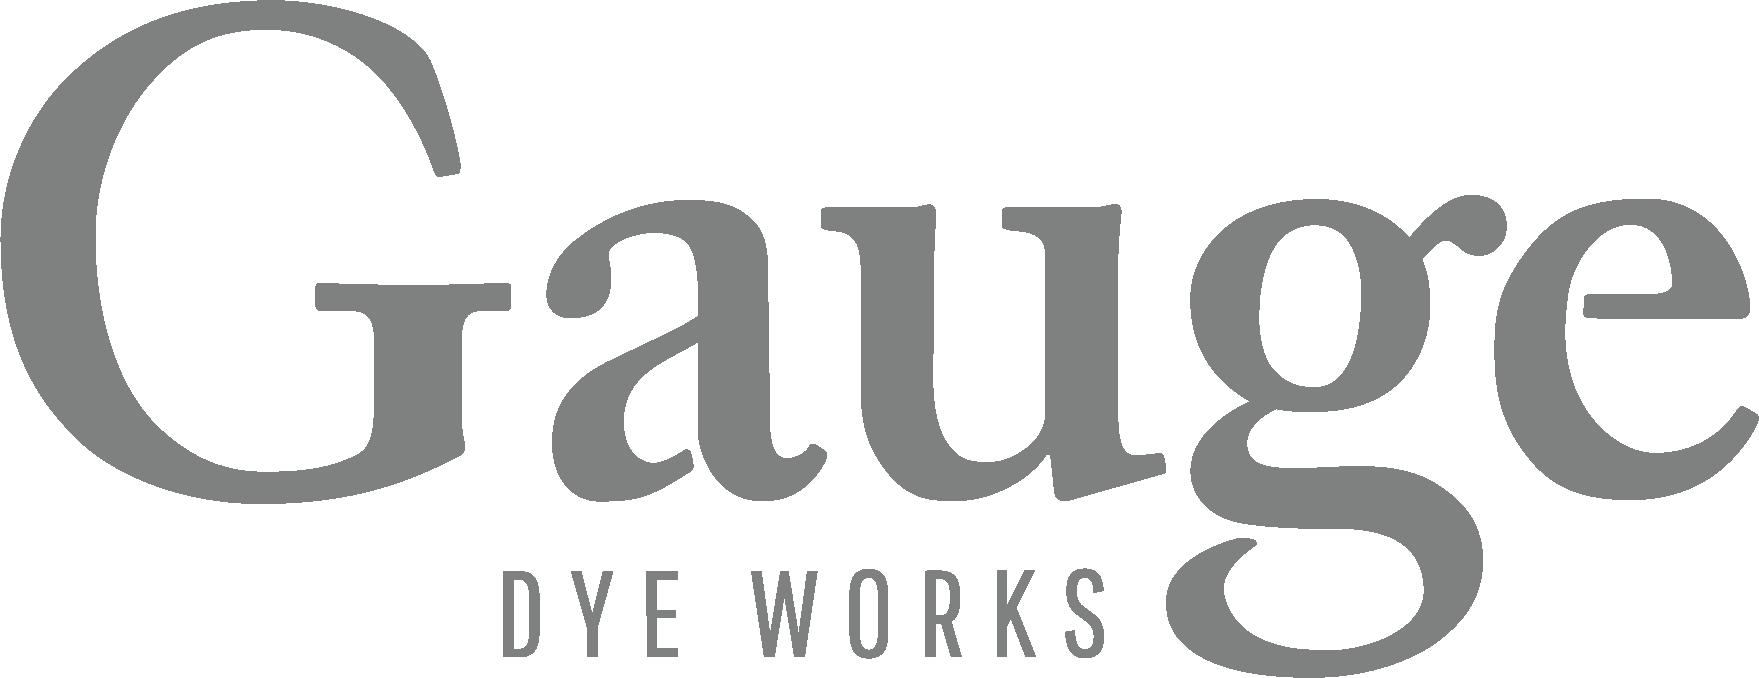 Gauge Dye Works logo